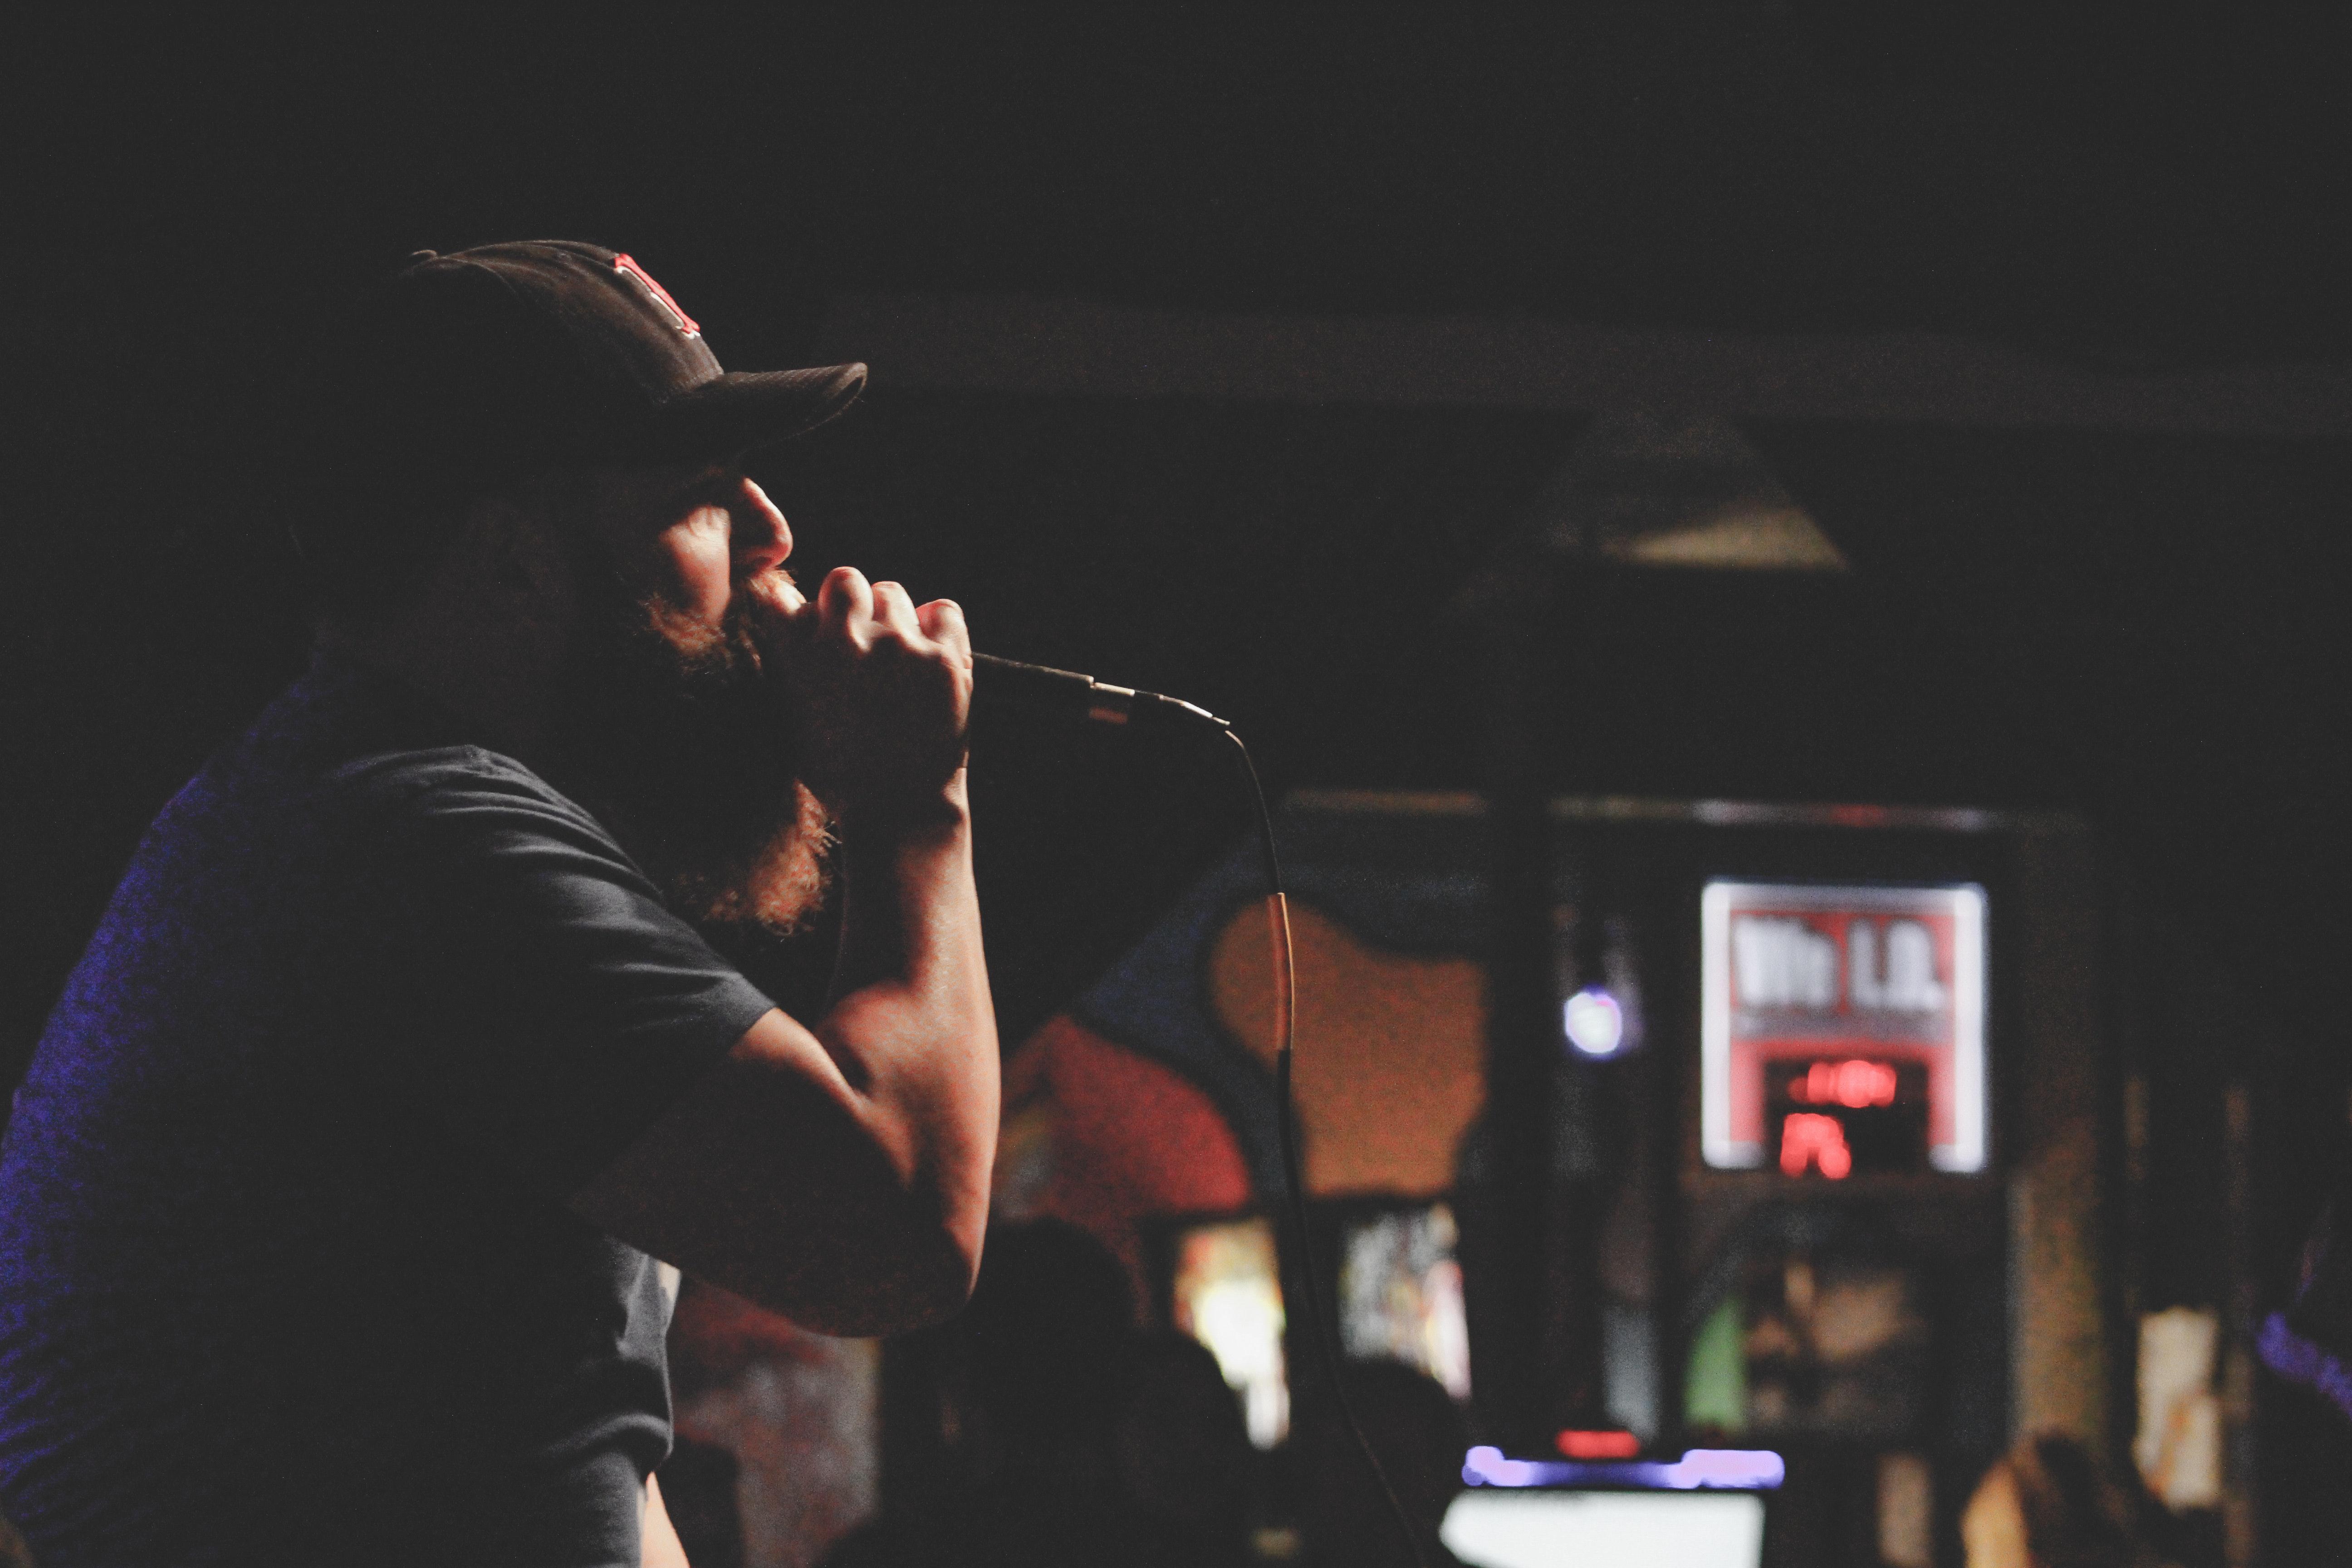 Man wearing grey shirt and black cap singing using corded microphone photo